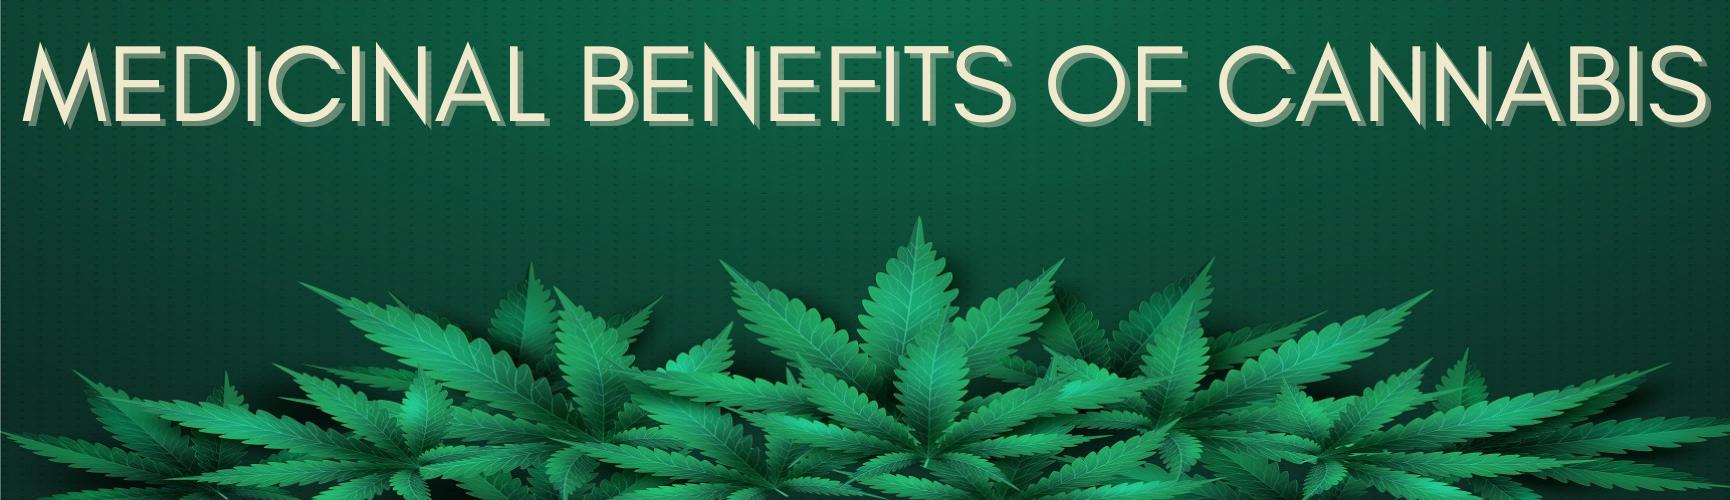 Medicinal Benefits of Cannabis